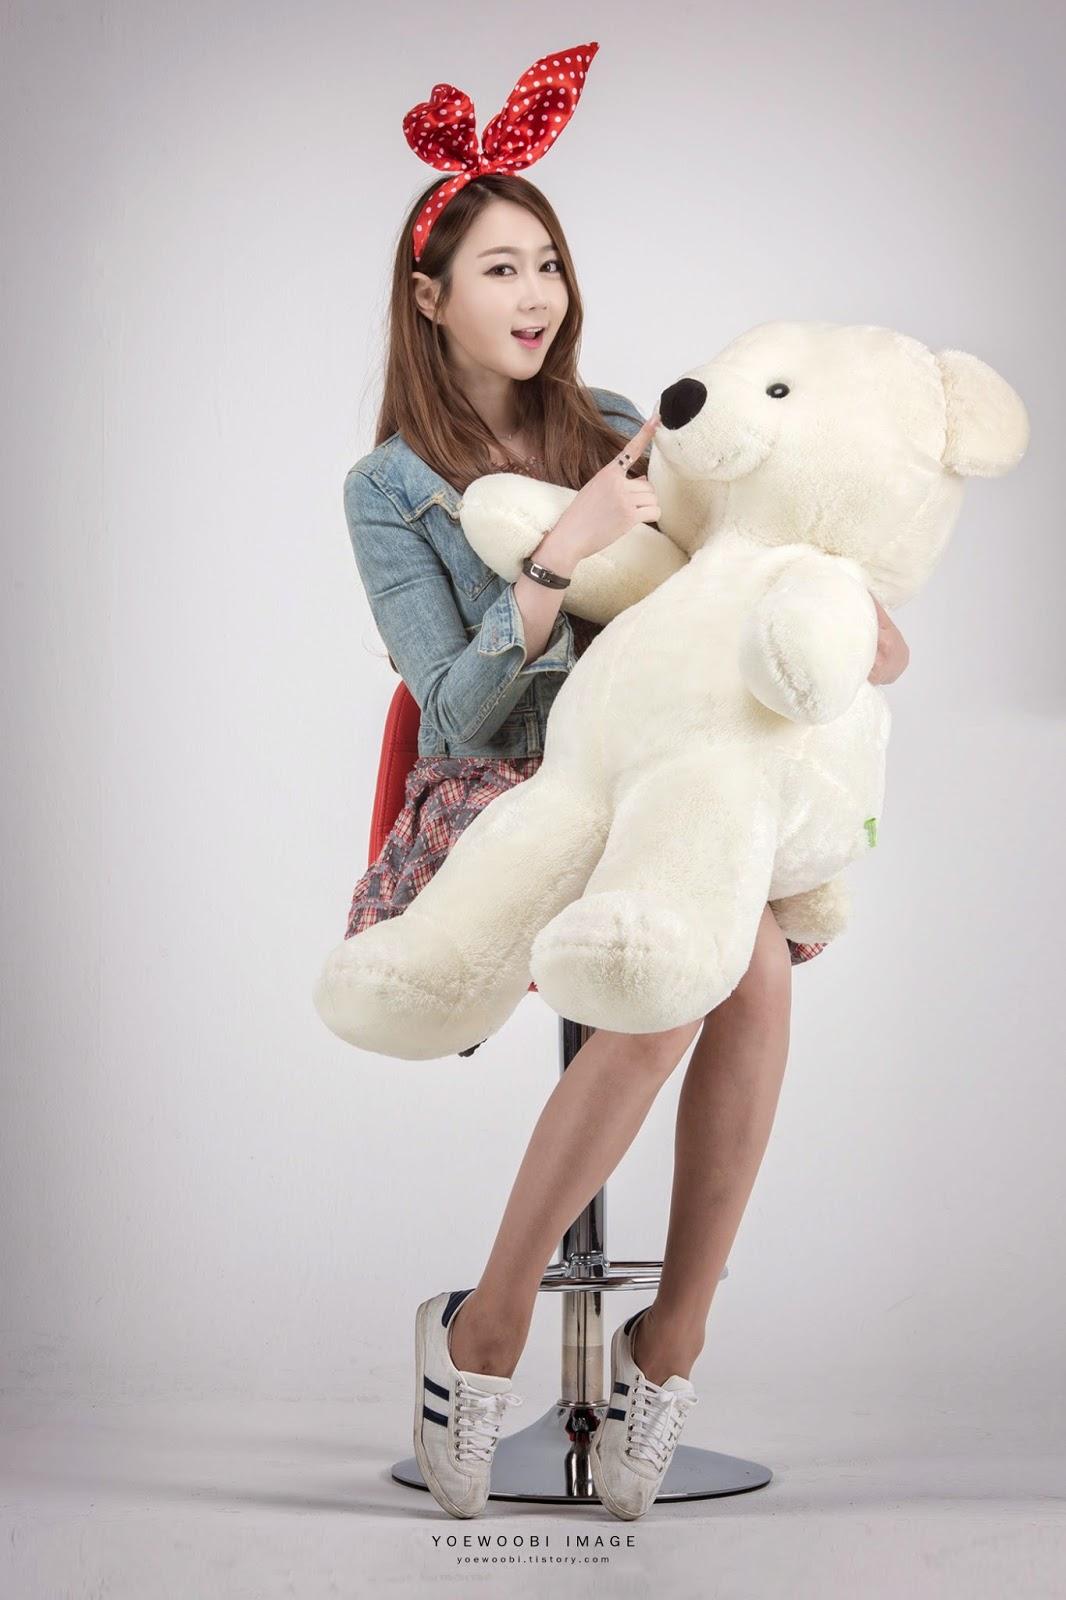 5 Han Chae Yee - IN-N-OUT - very cute asian girl-girlcute4u.blogspot.com